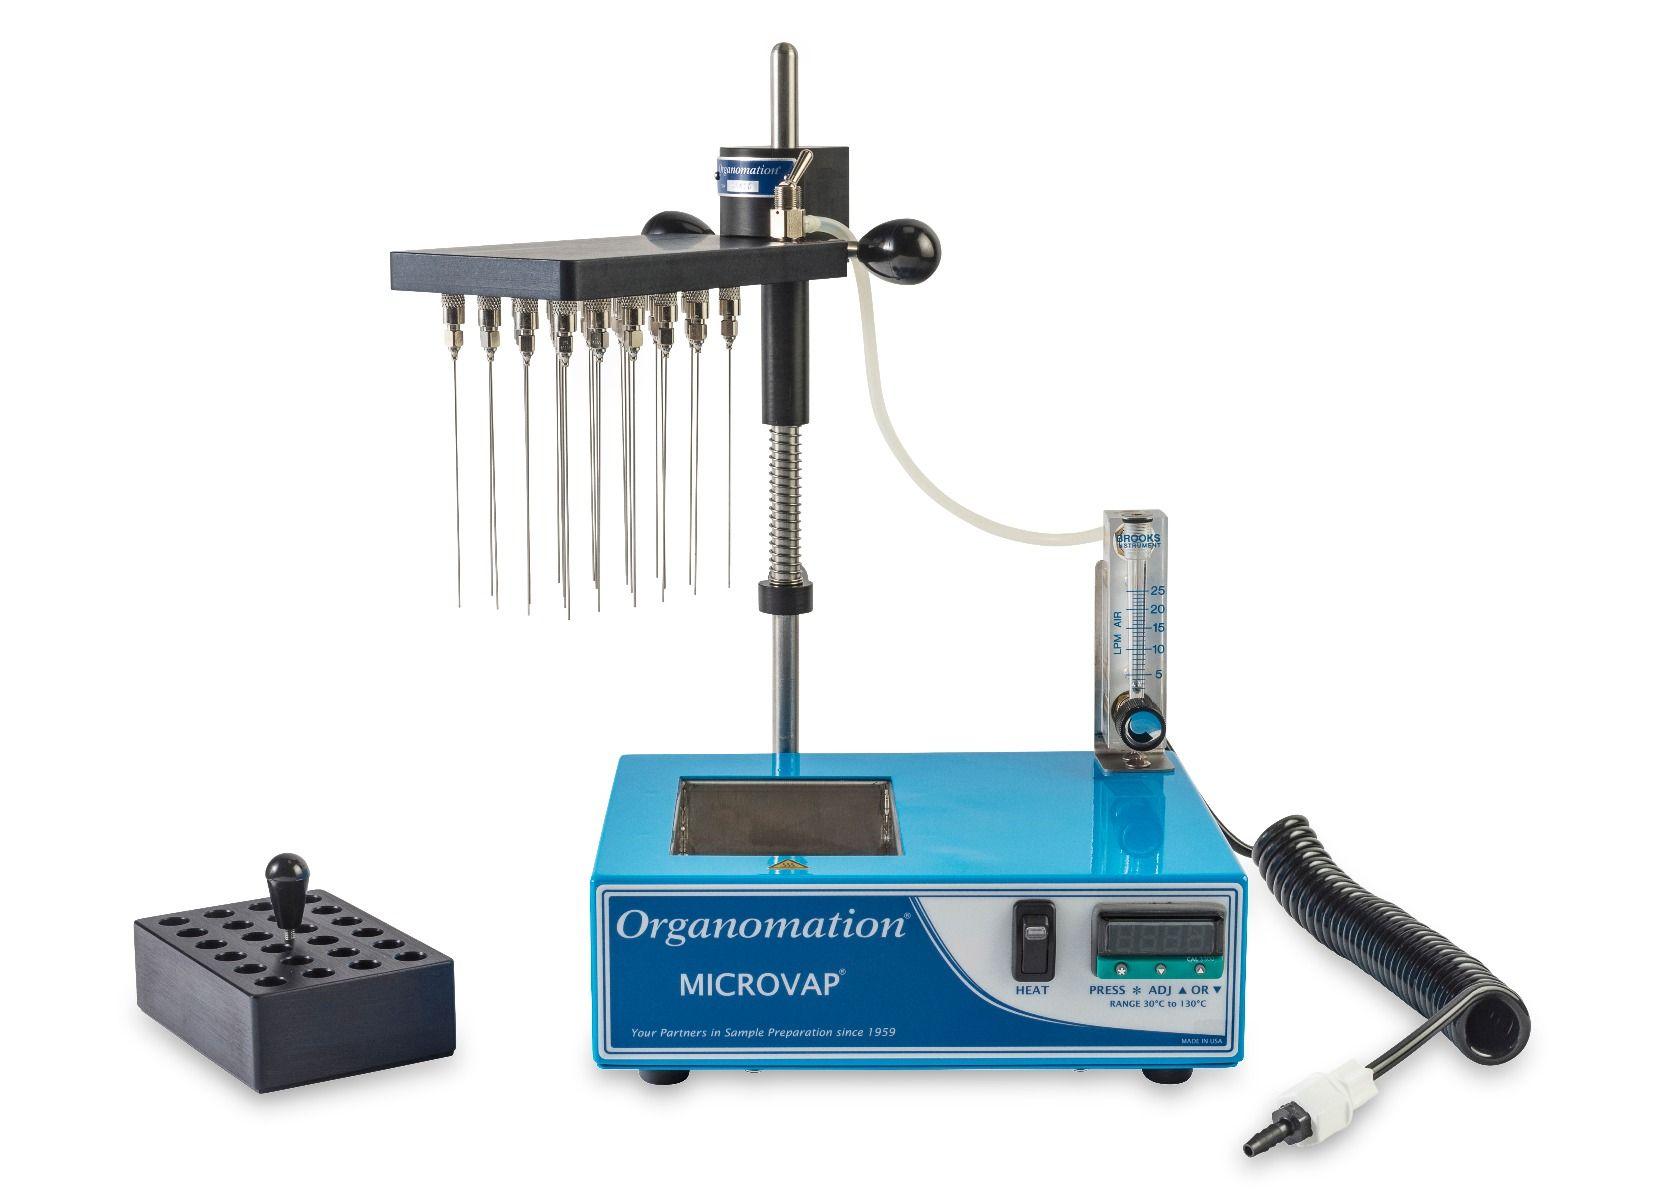 Organomation 6, 15, 24 position MICROVAP®